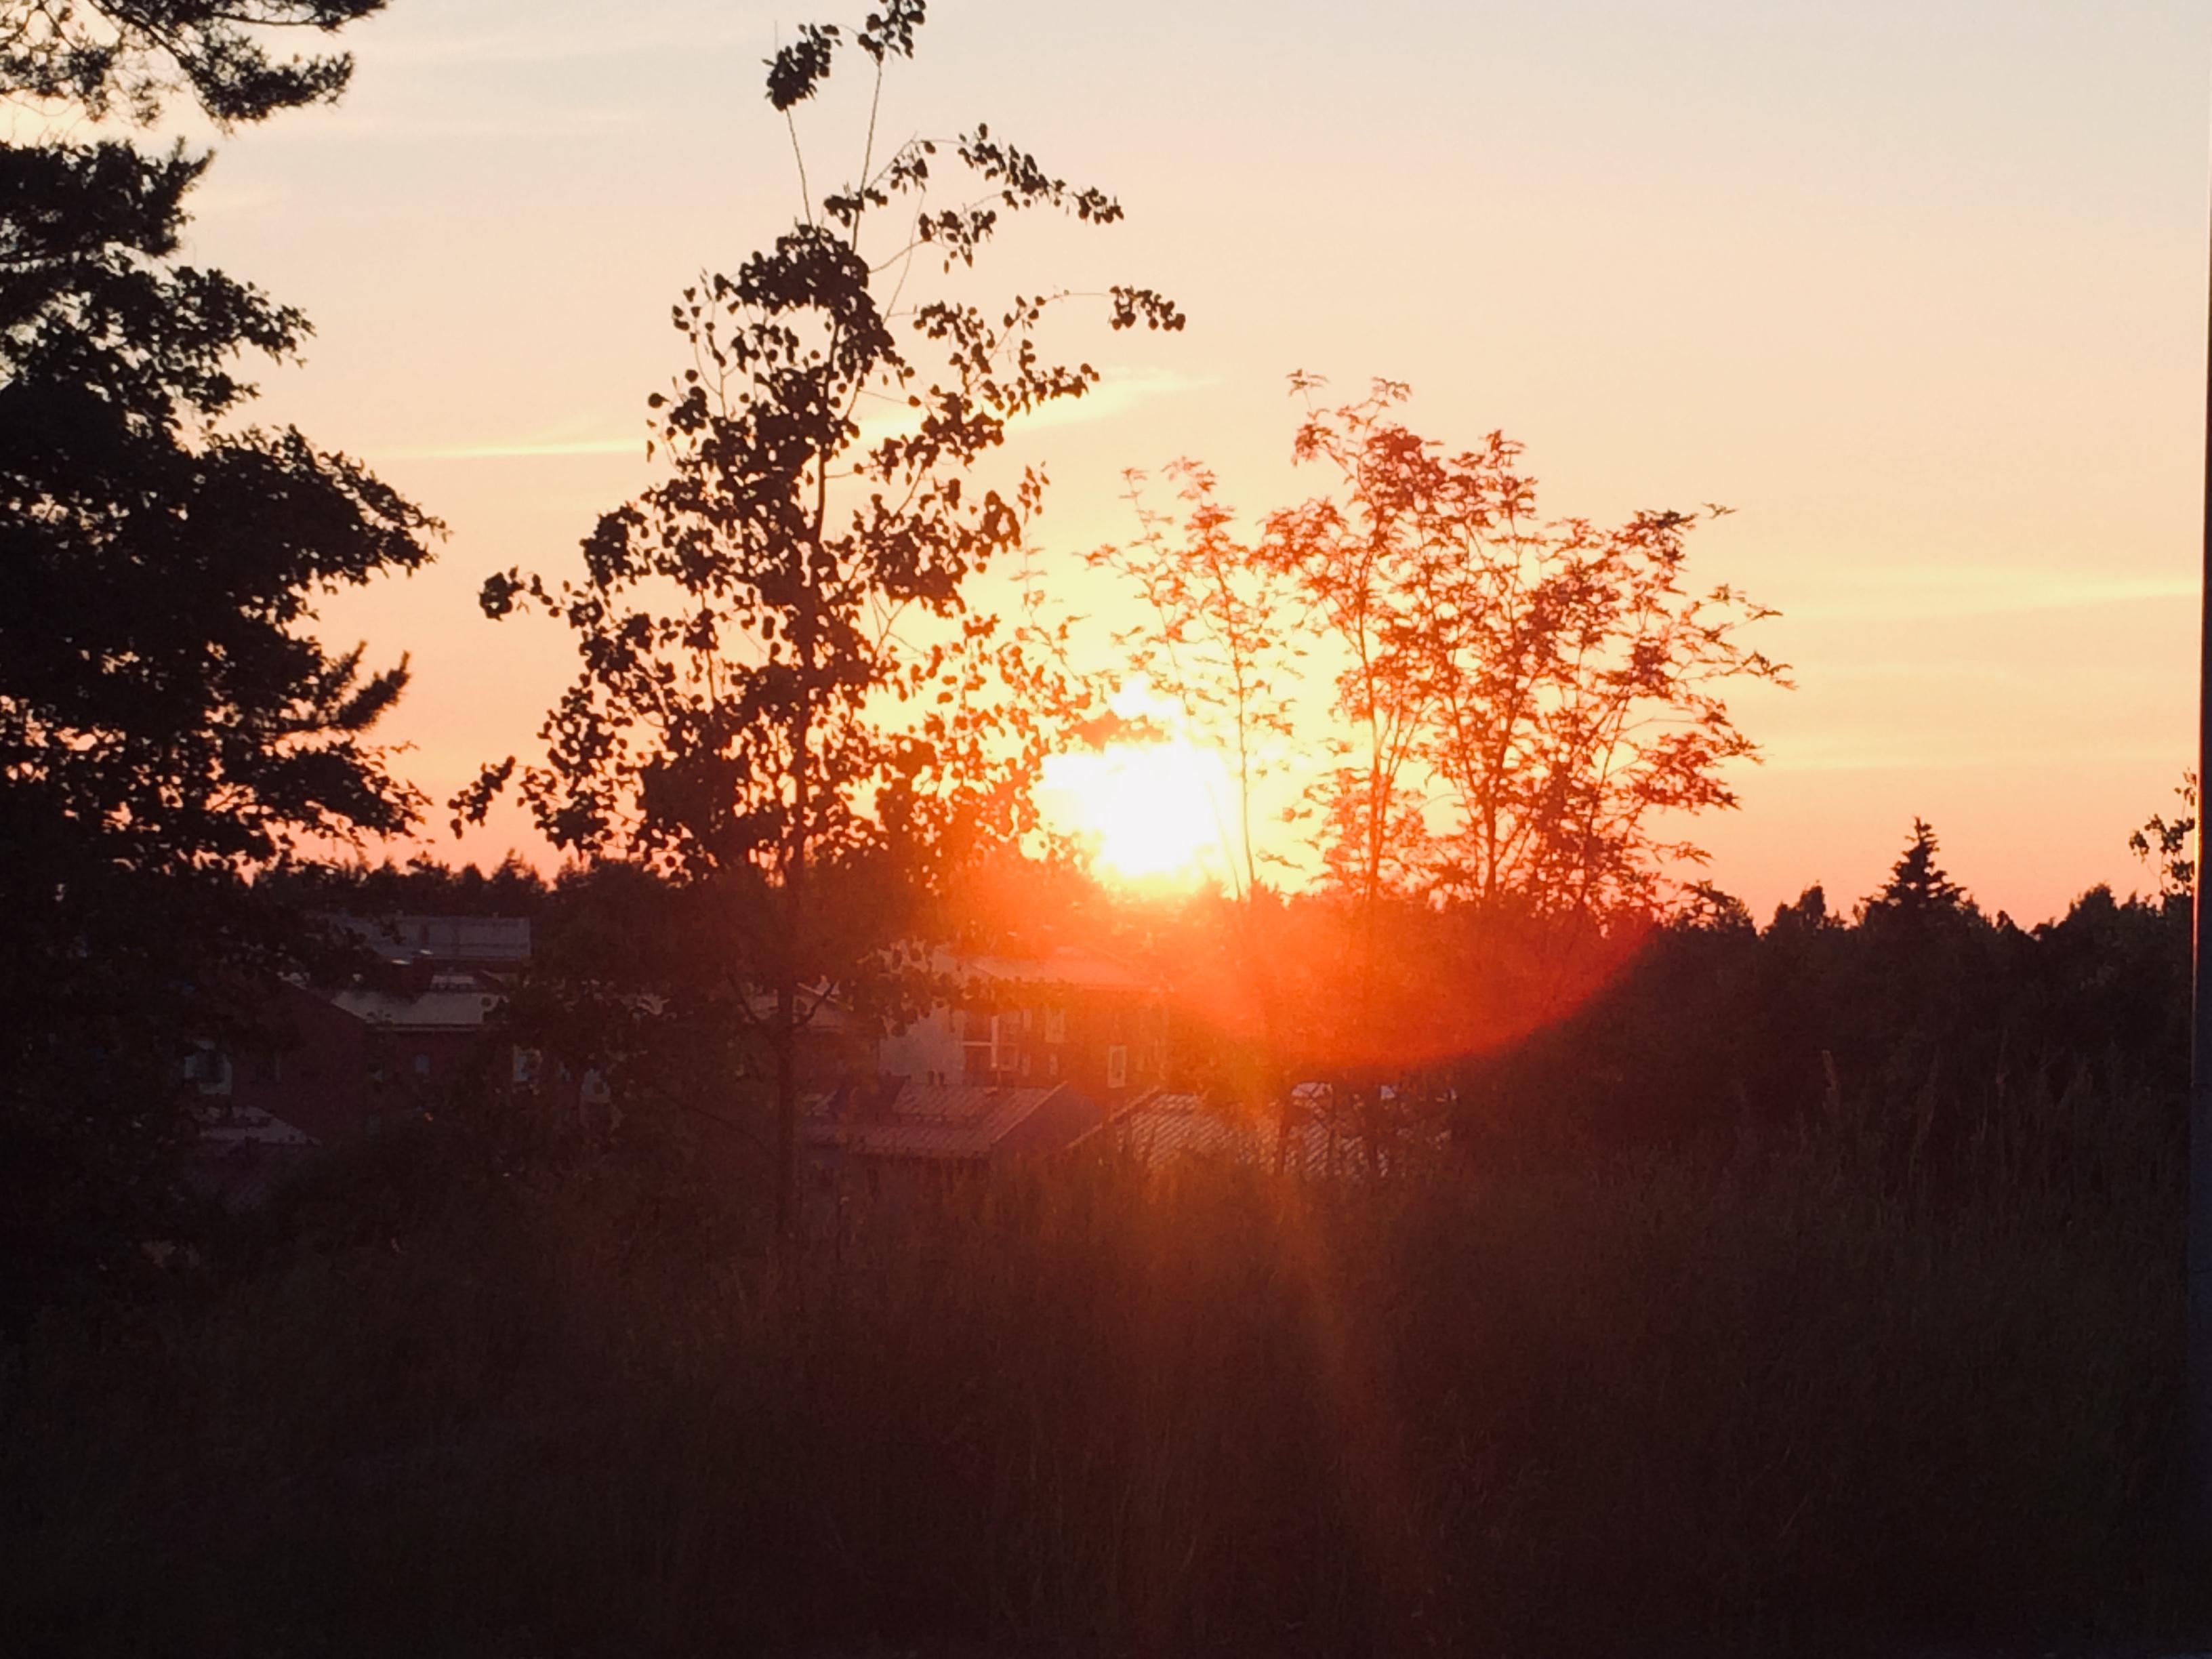 Sonnenuntergang in Jakomäki